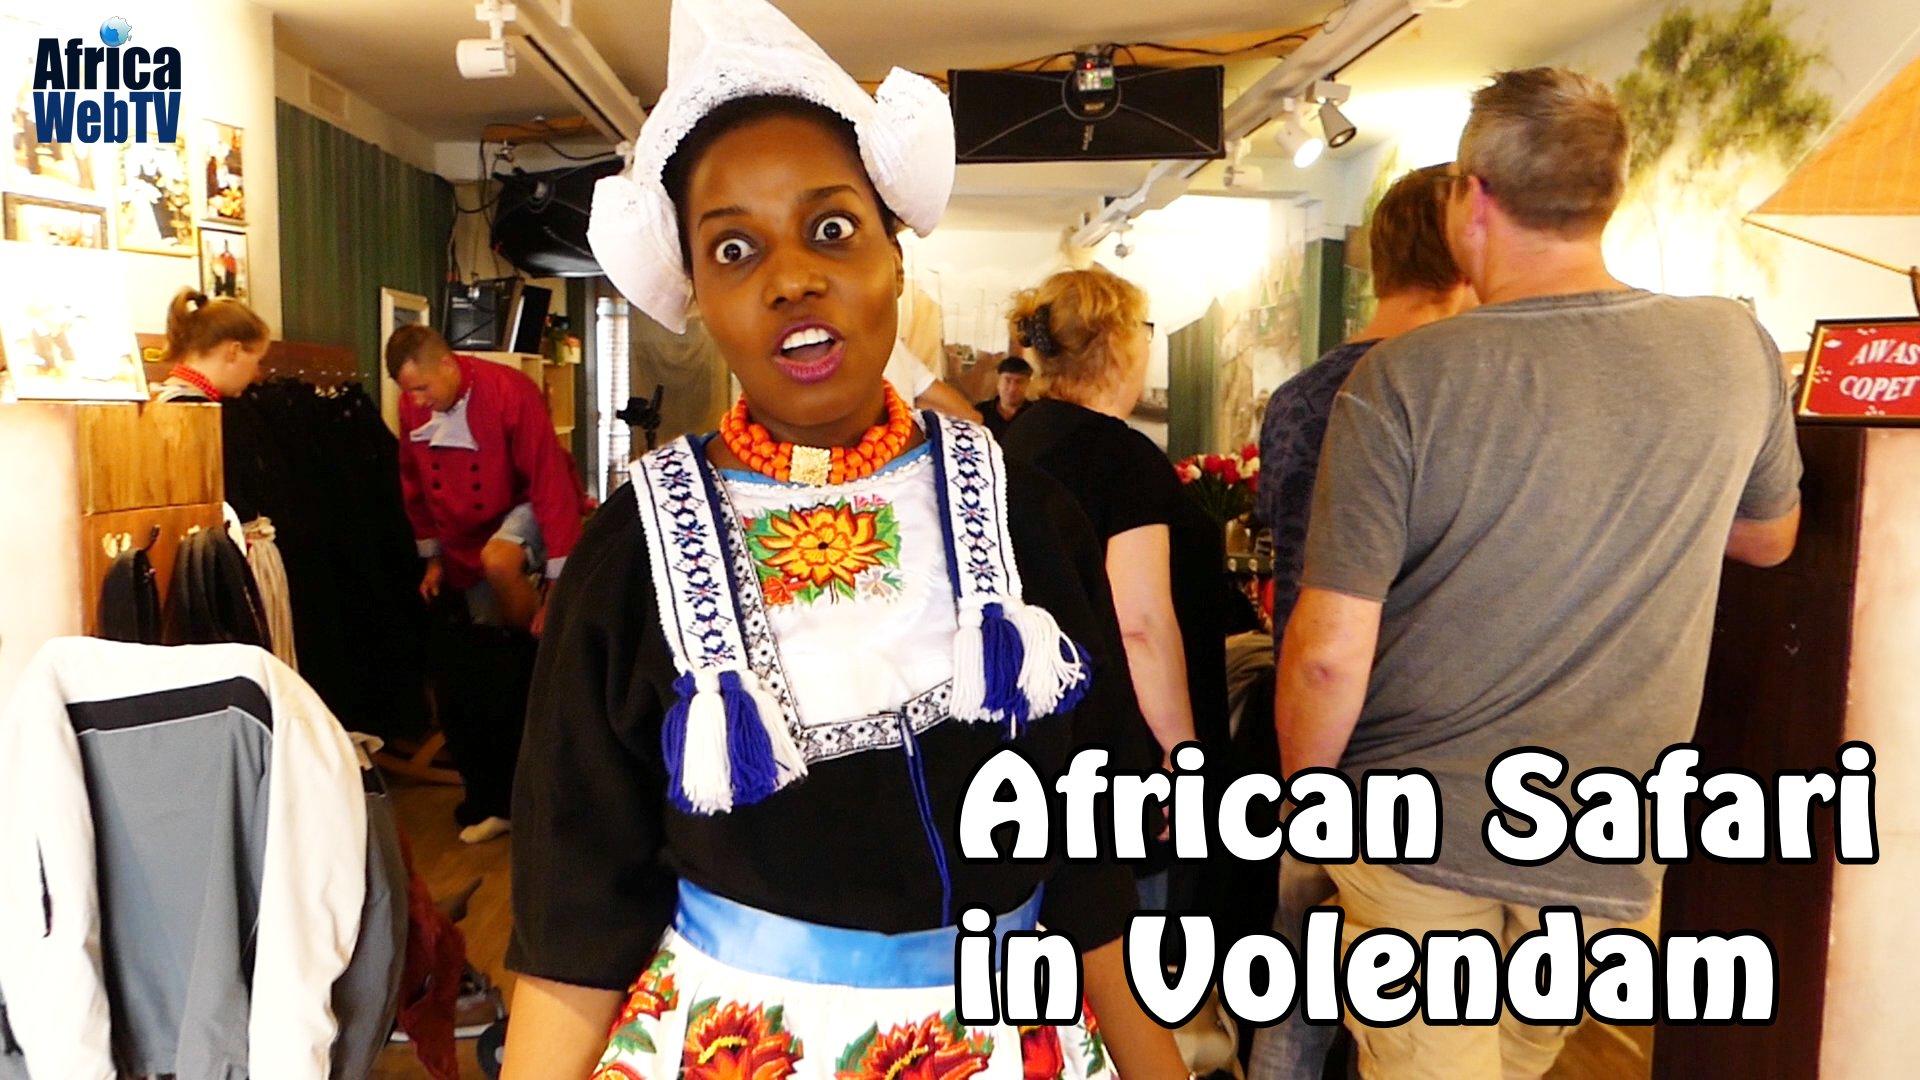 The Afropean Safari – The Volendam Experience